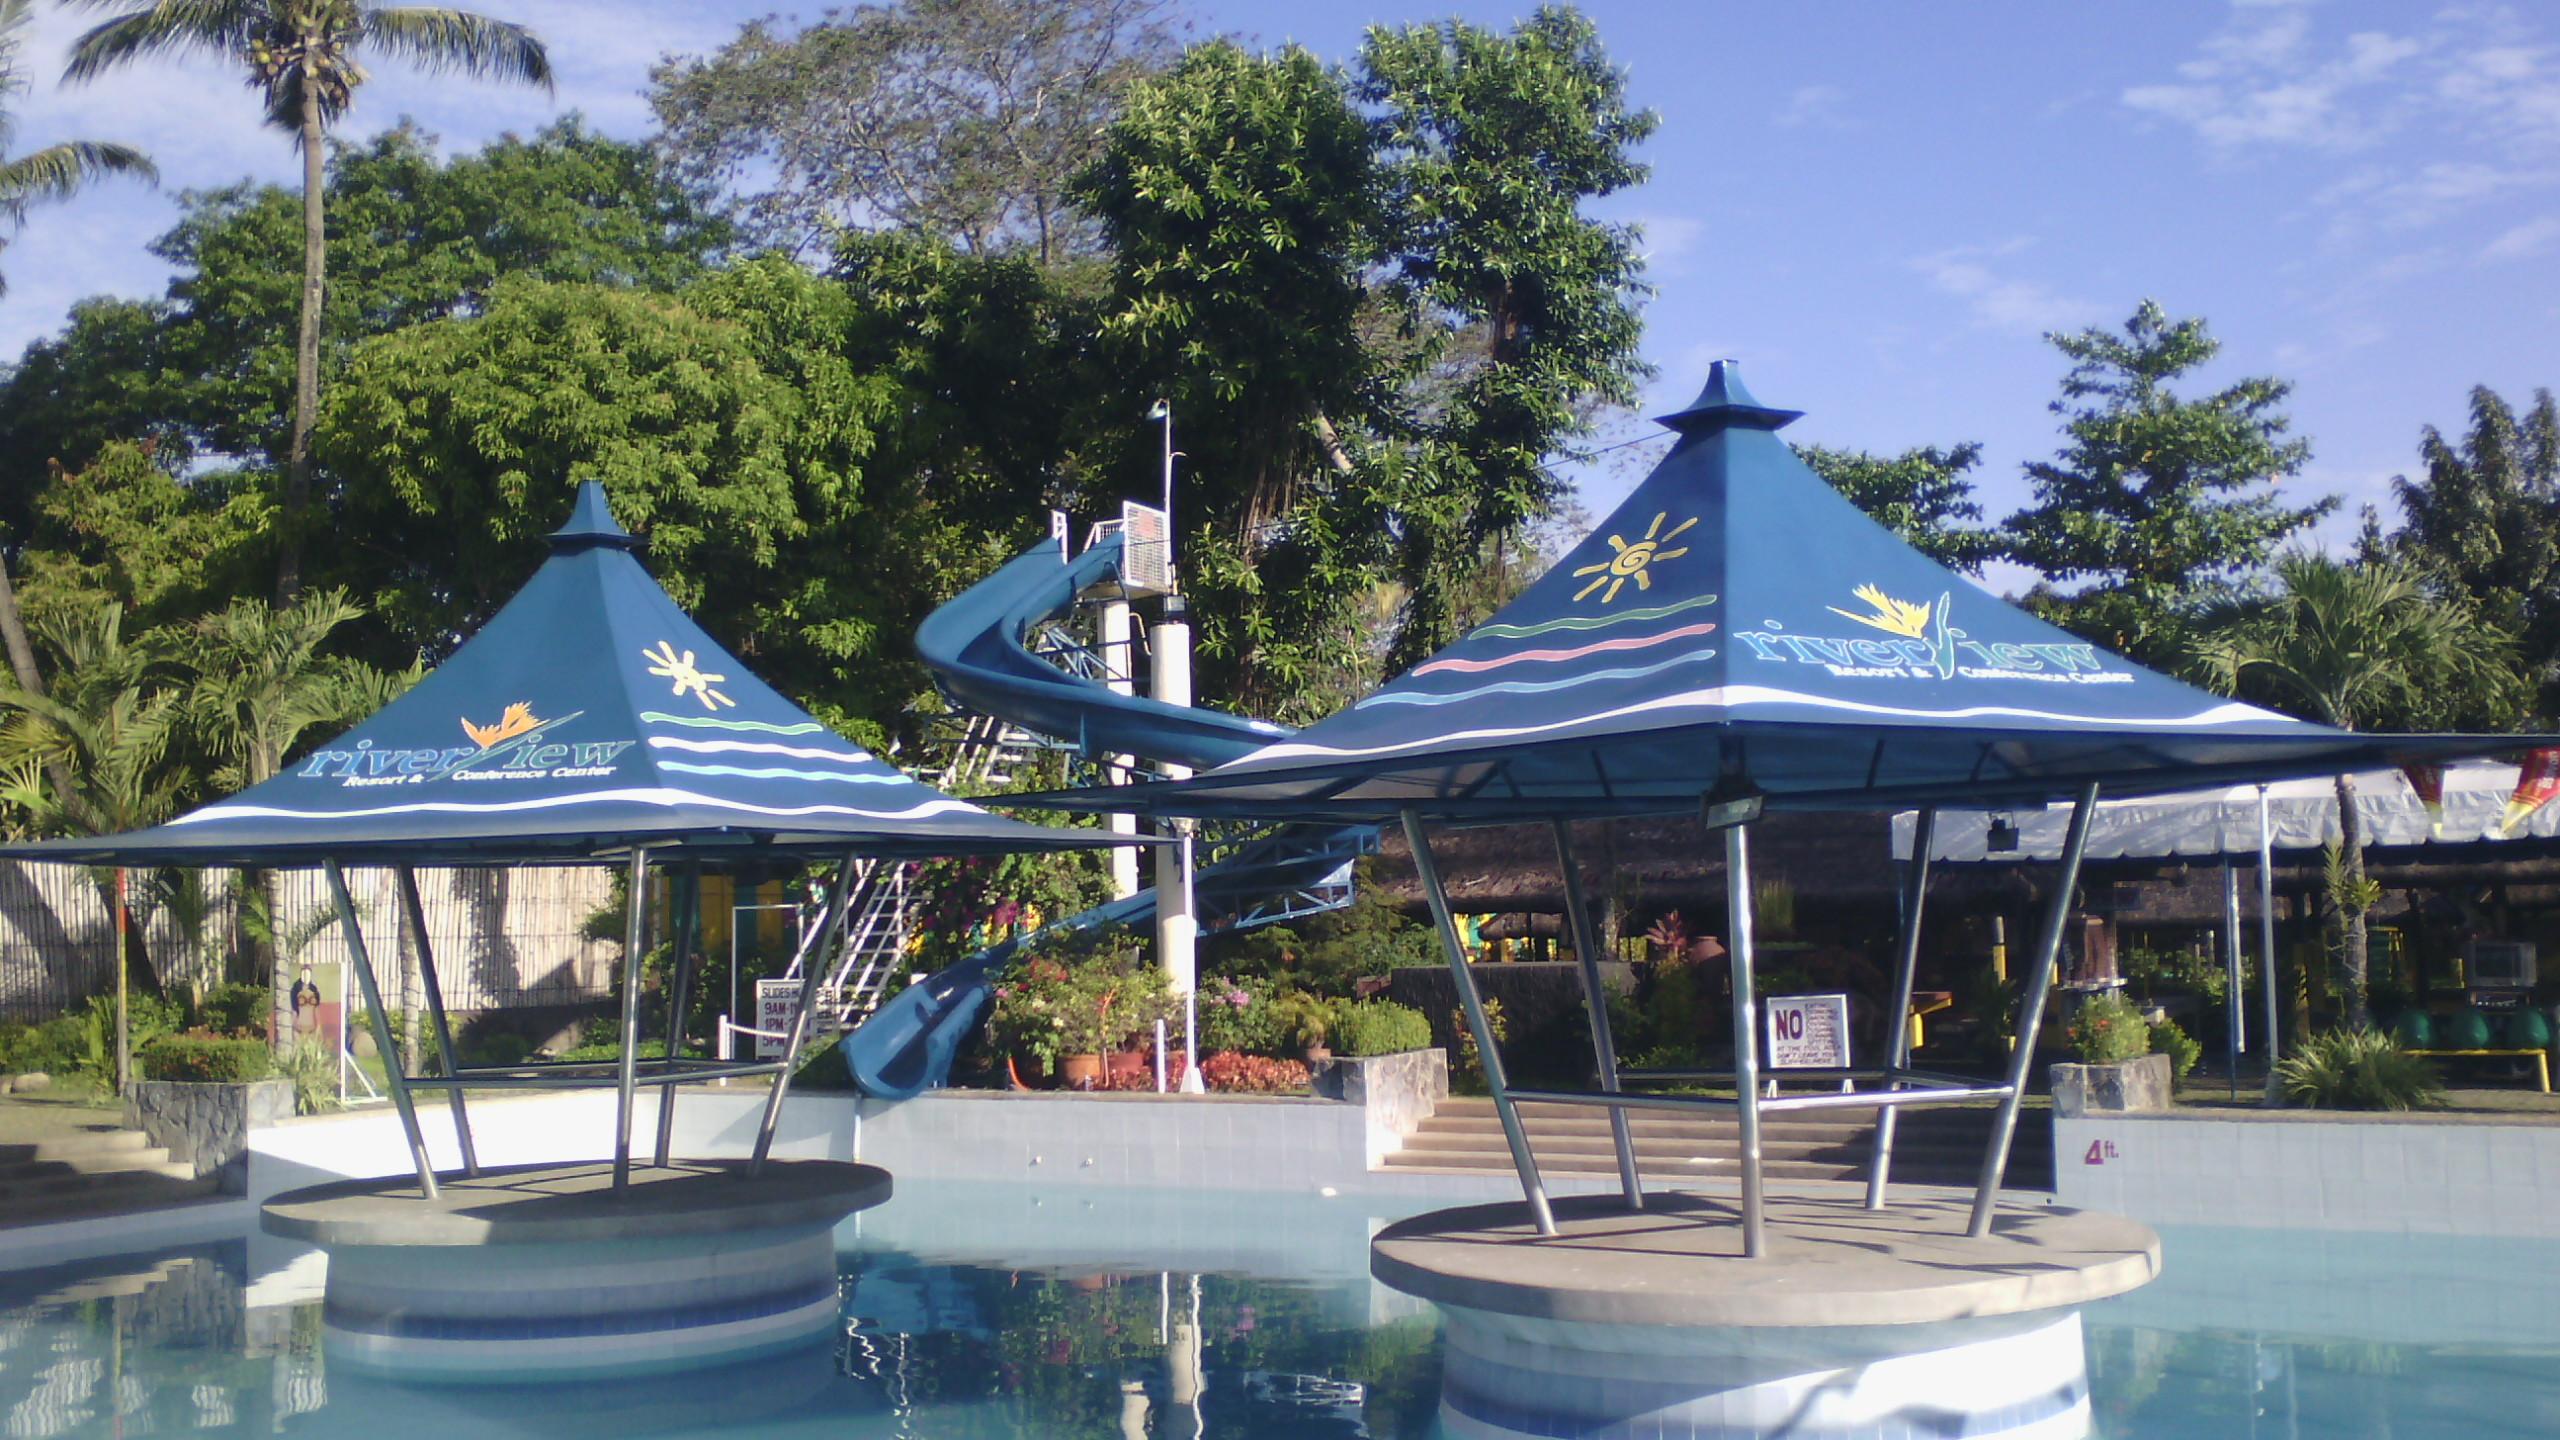 Riverview Resort & Conference Center